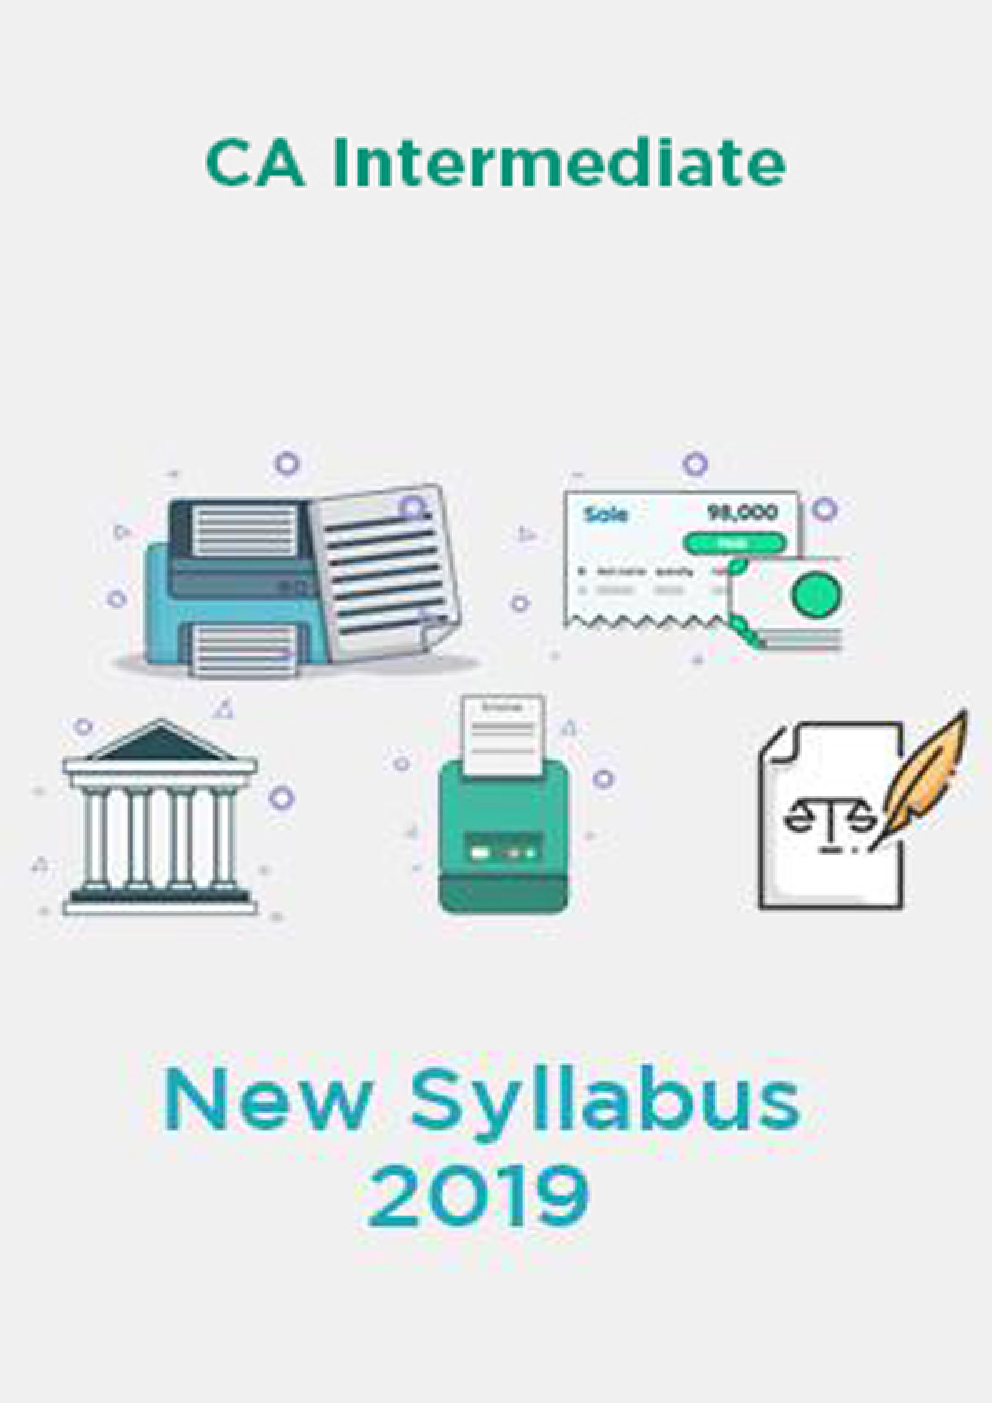 CA Intermediate New Syllabus 2019 - Page 1